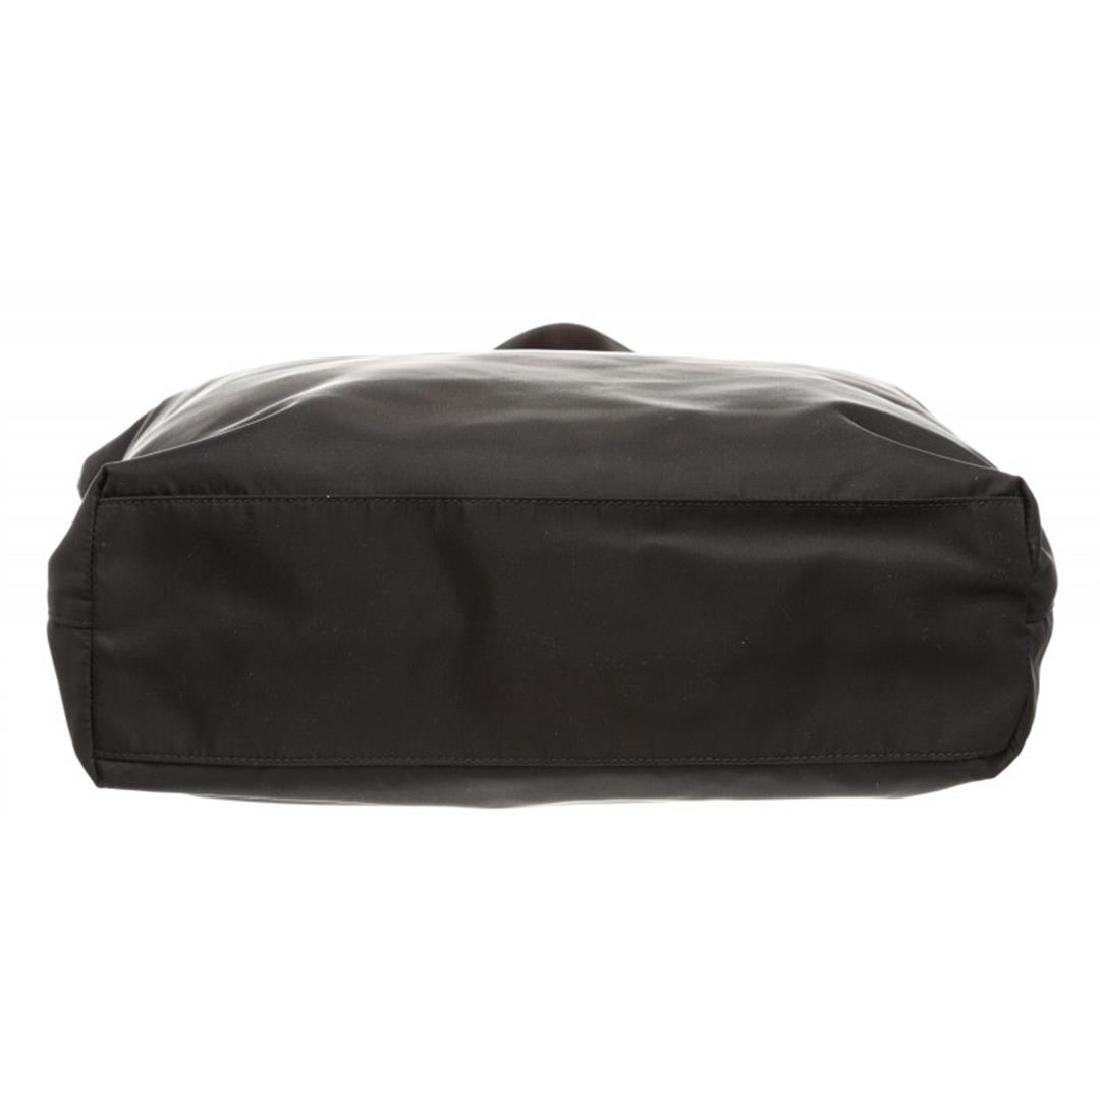 Prada Black Nylon Leather Long Tote Shoulder Bag - 4